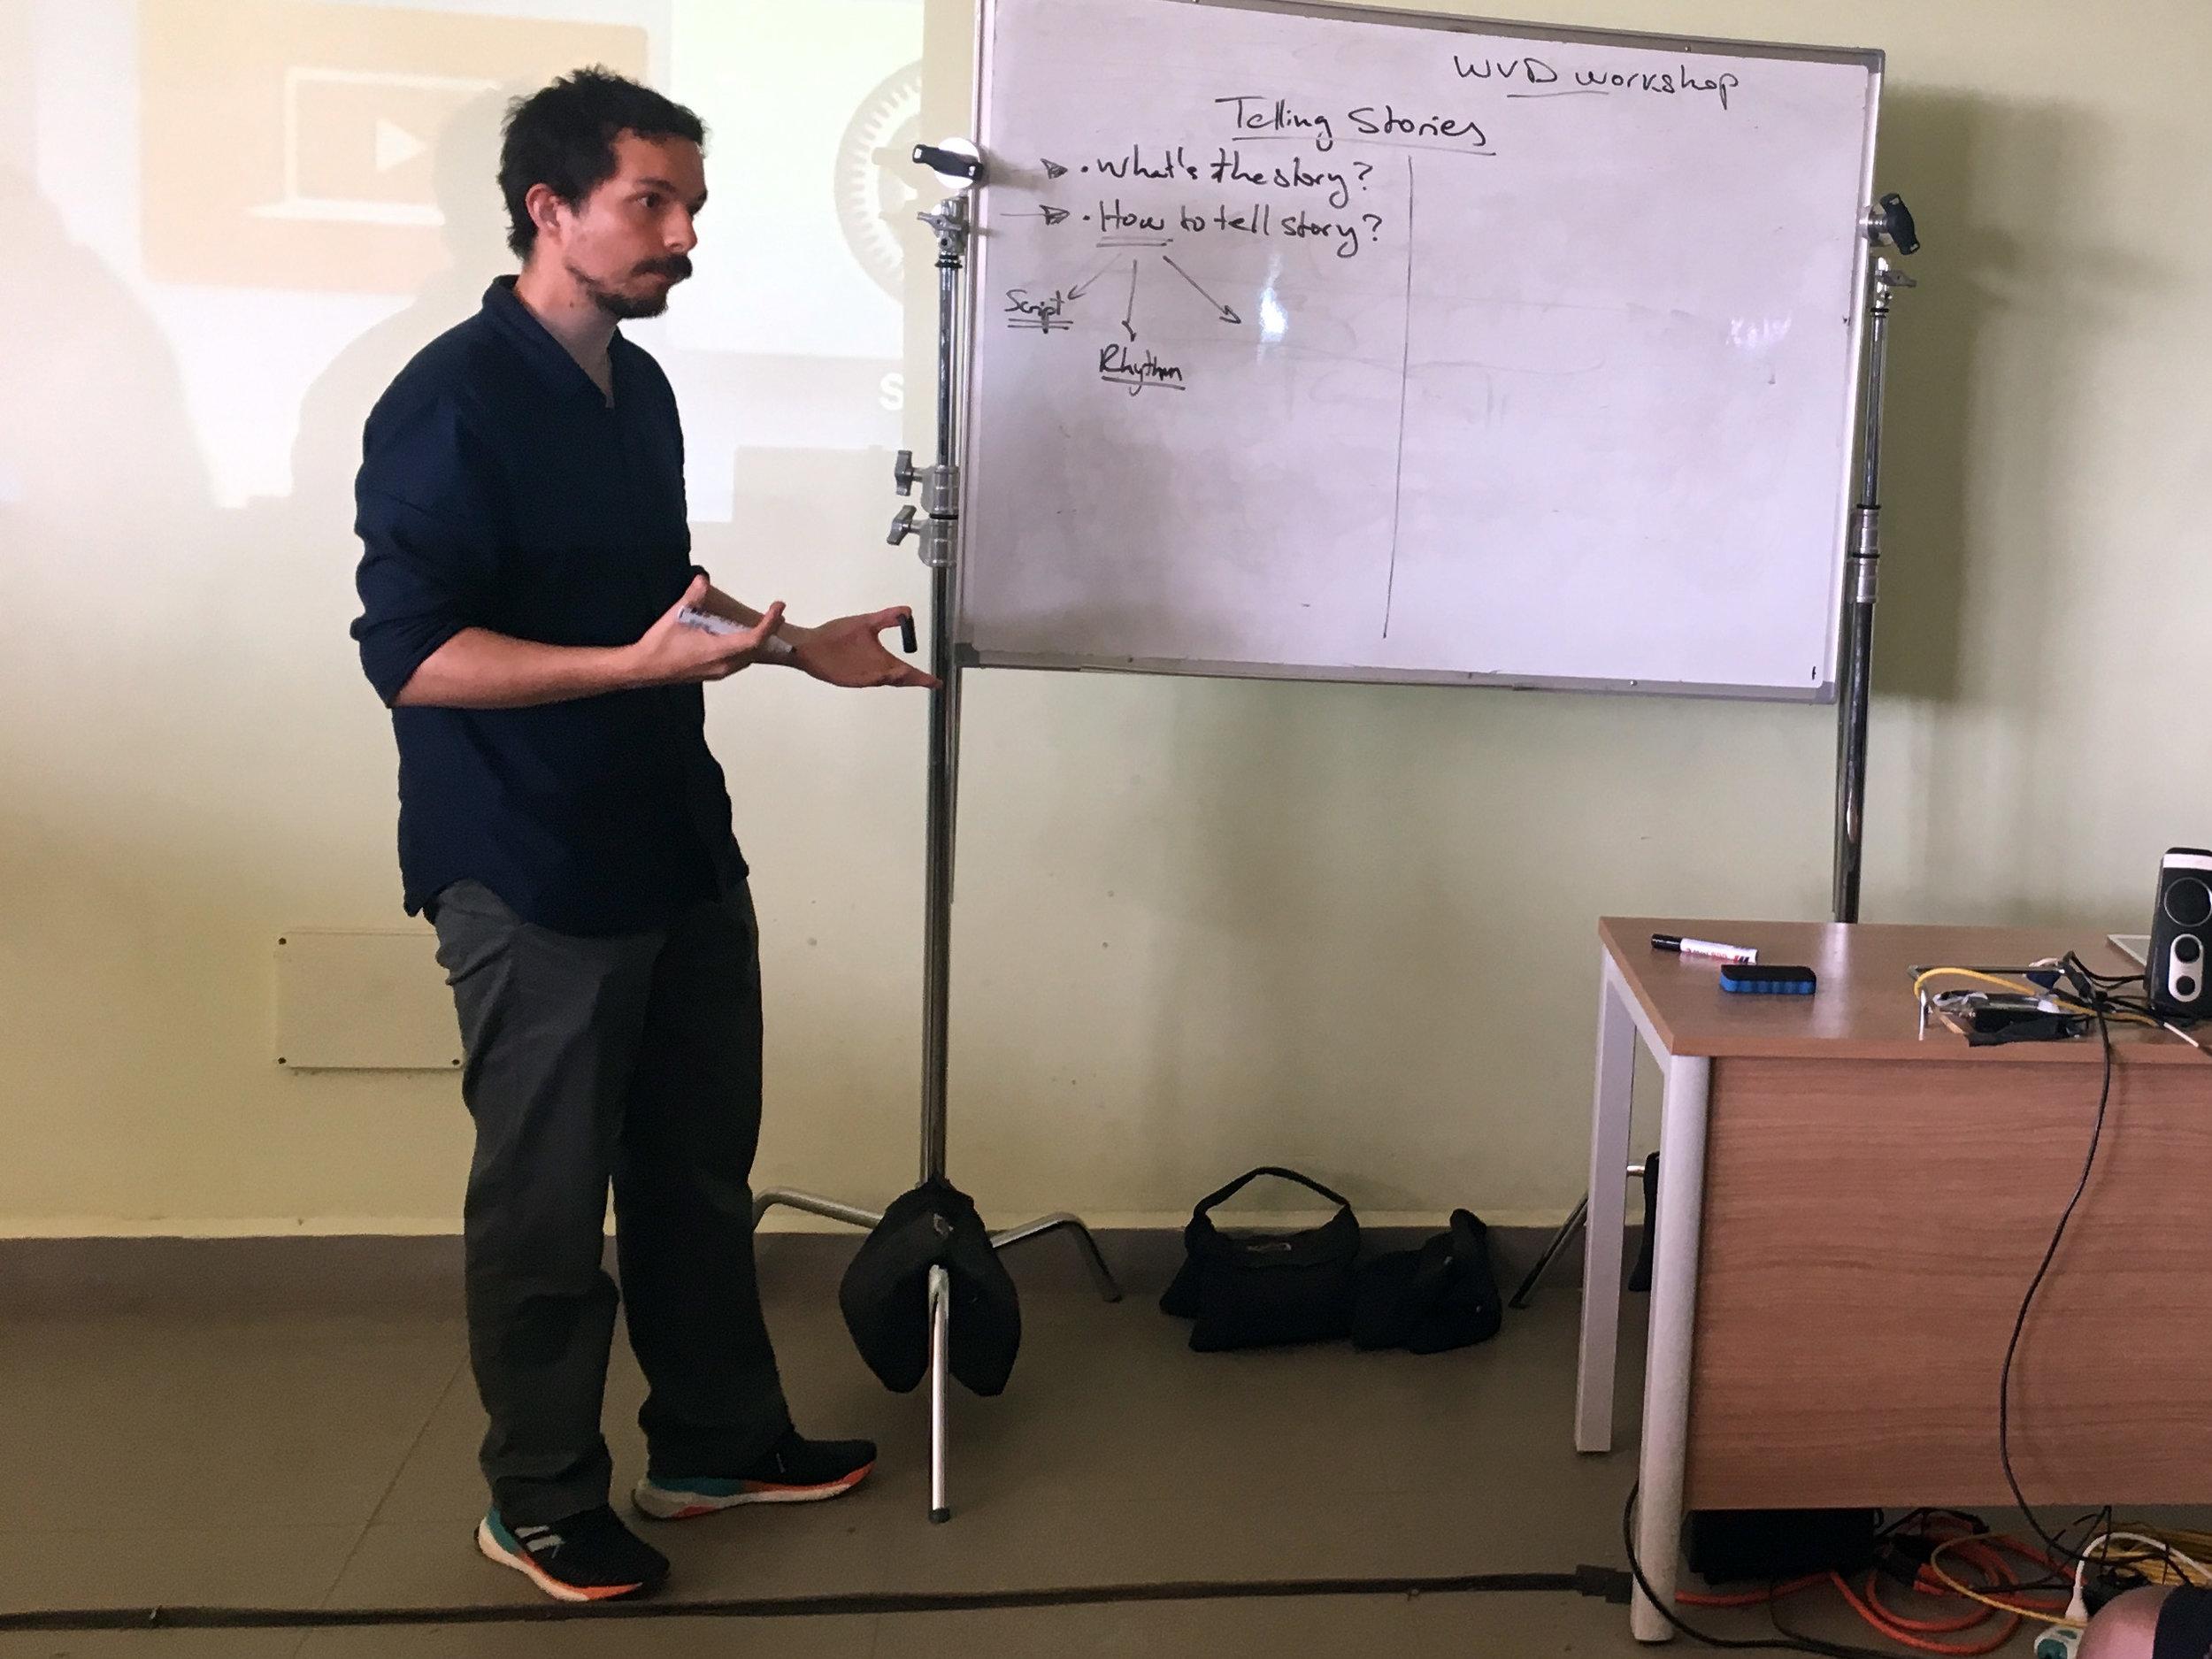 Nicolas Cuellar discusses storytelling for new media.